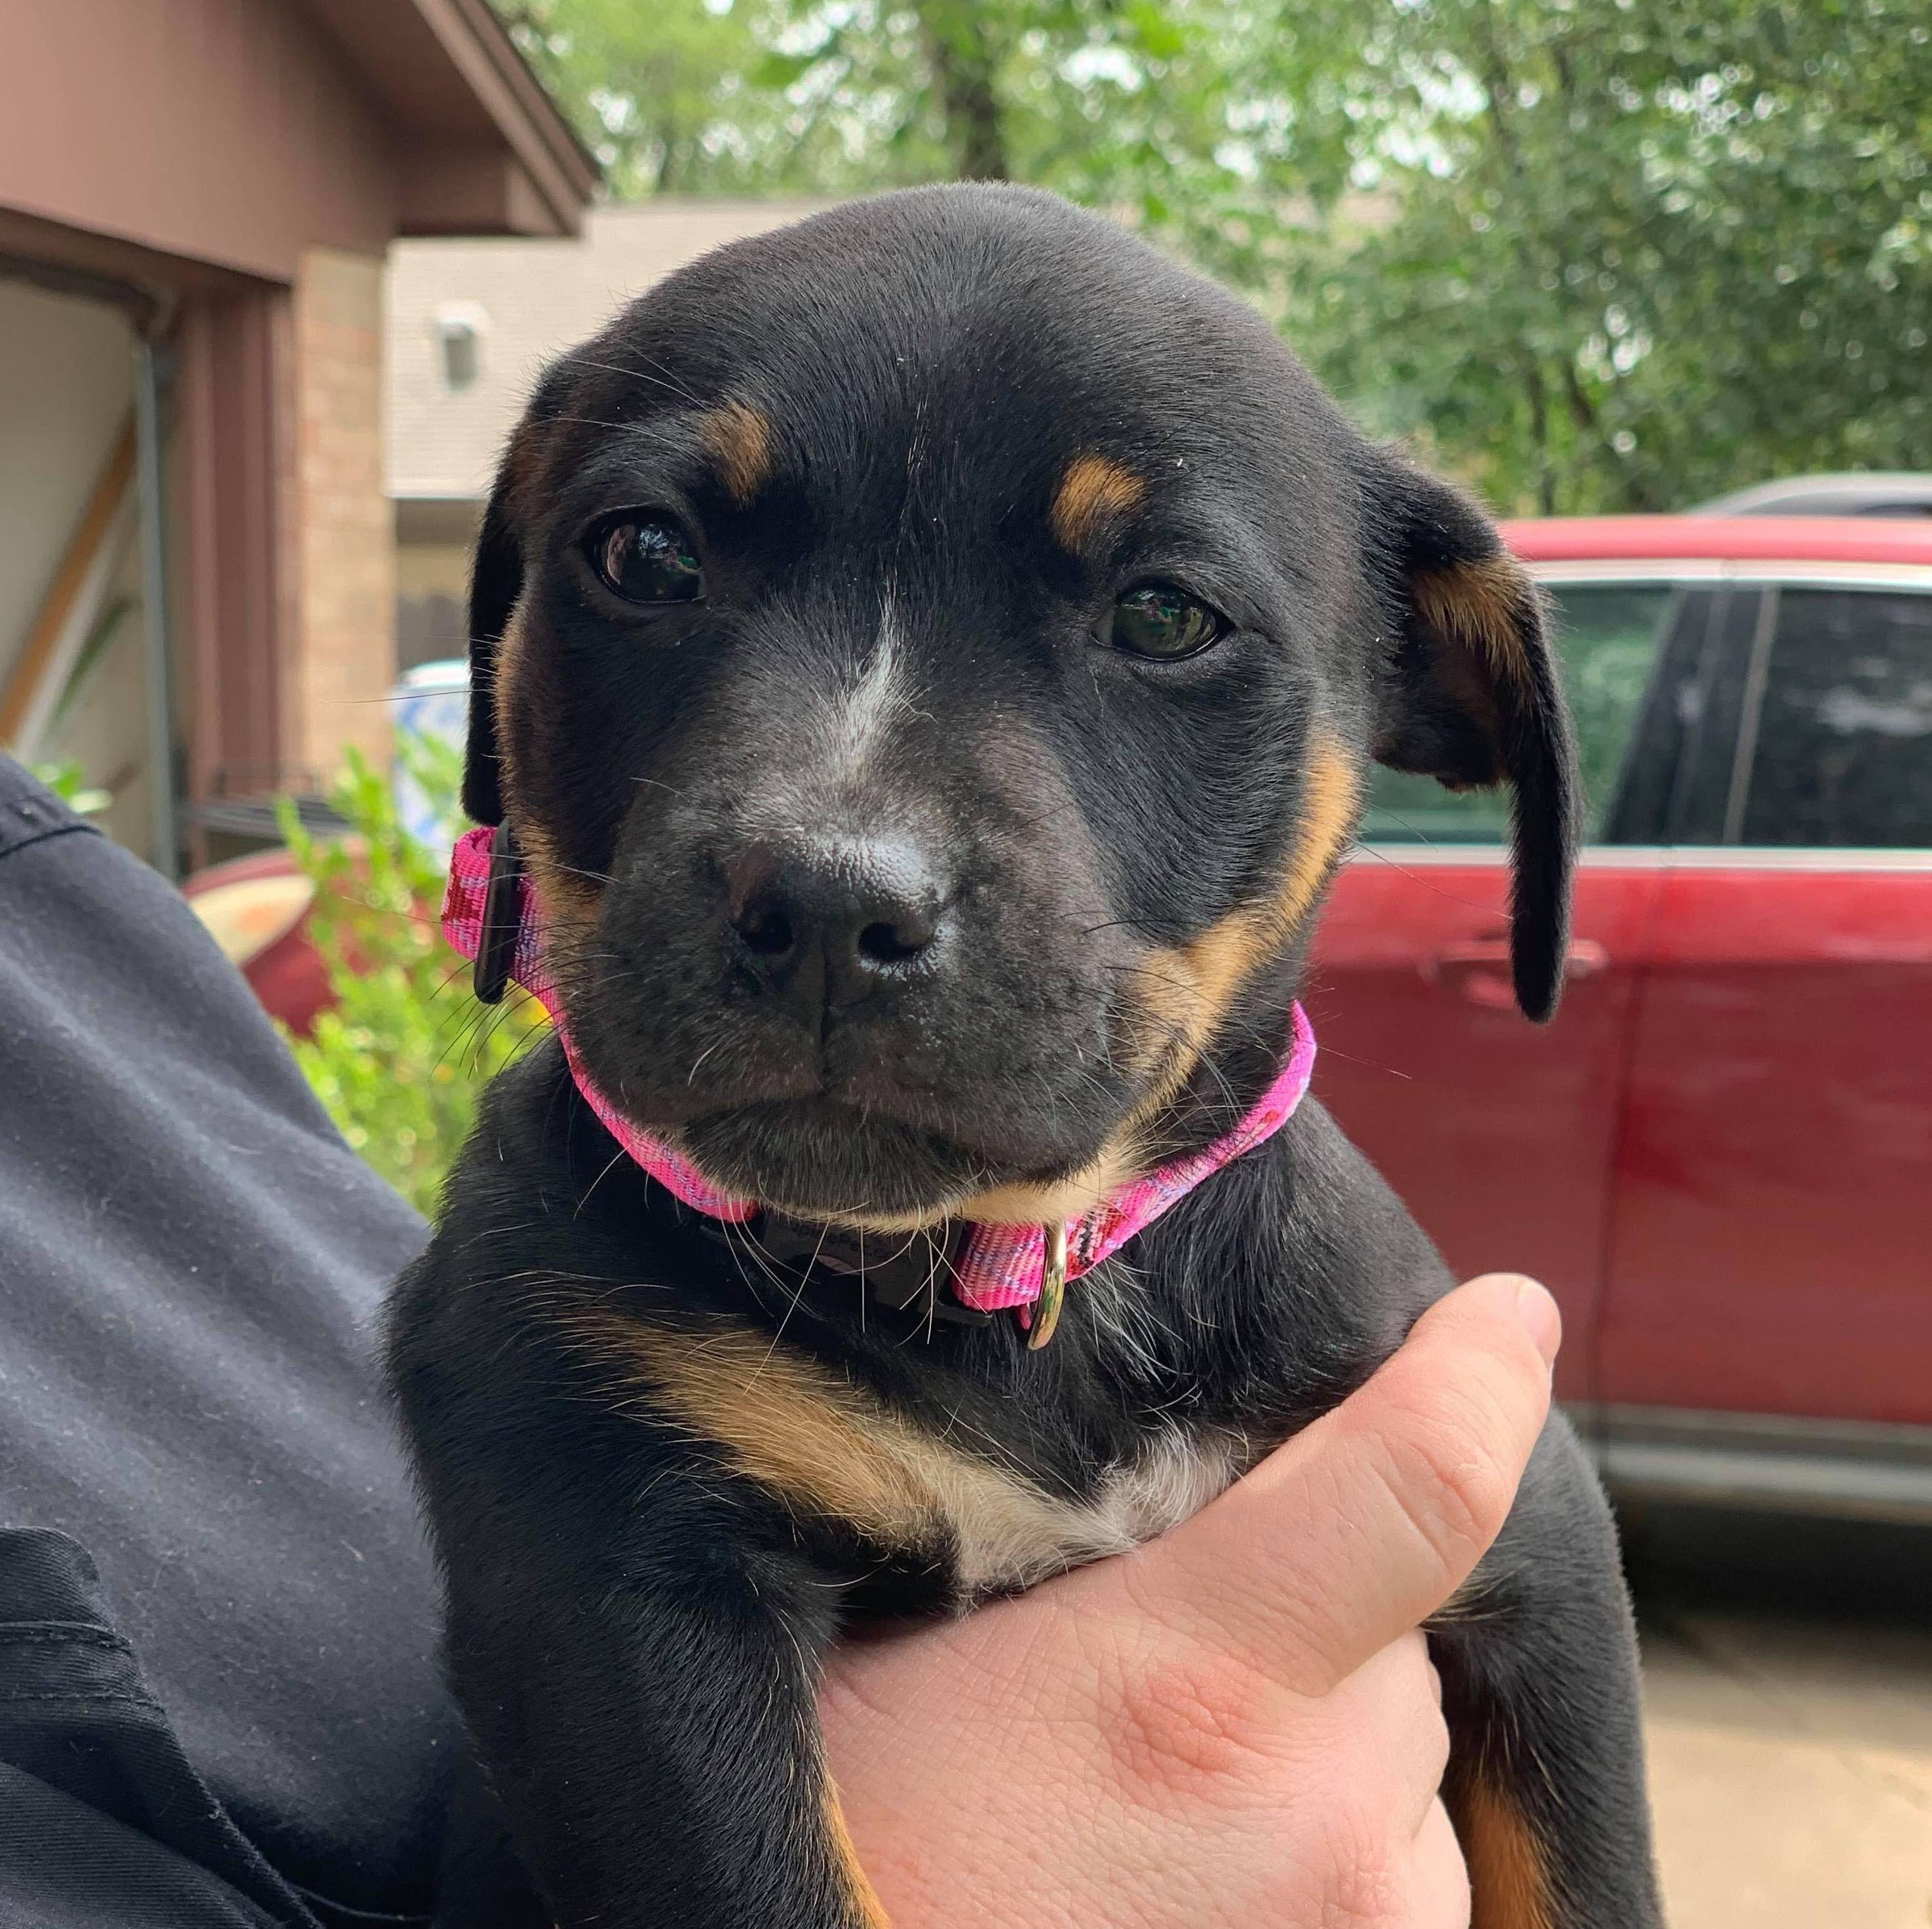 Pin on Adoptable puppies near Houston, Tx.